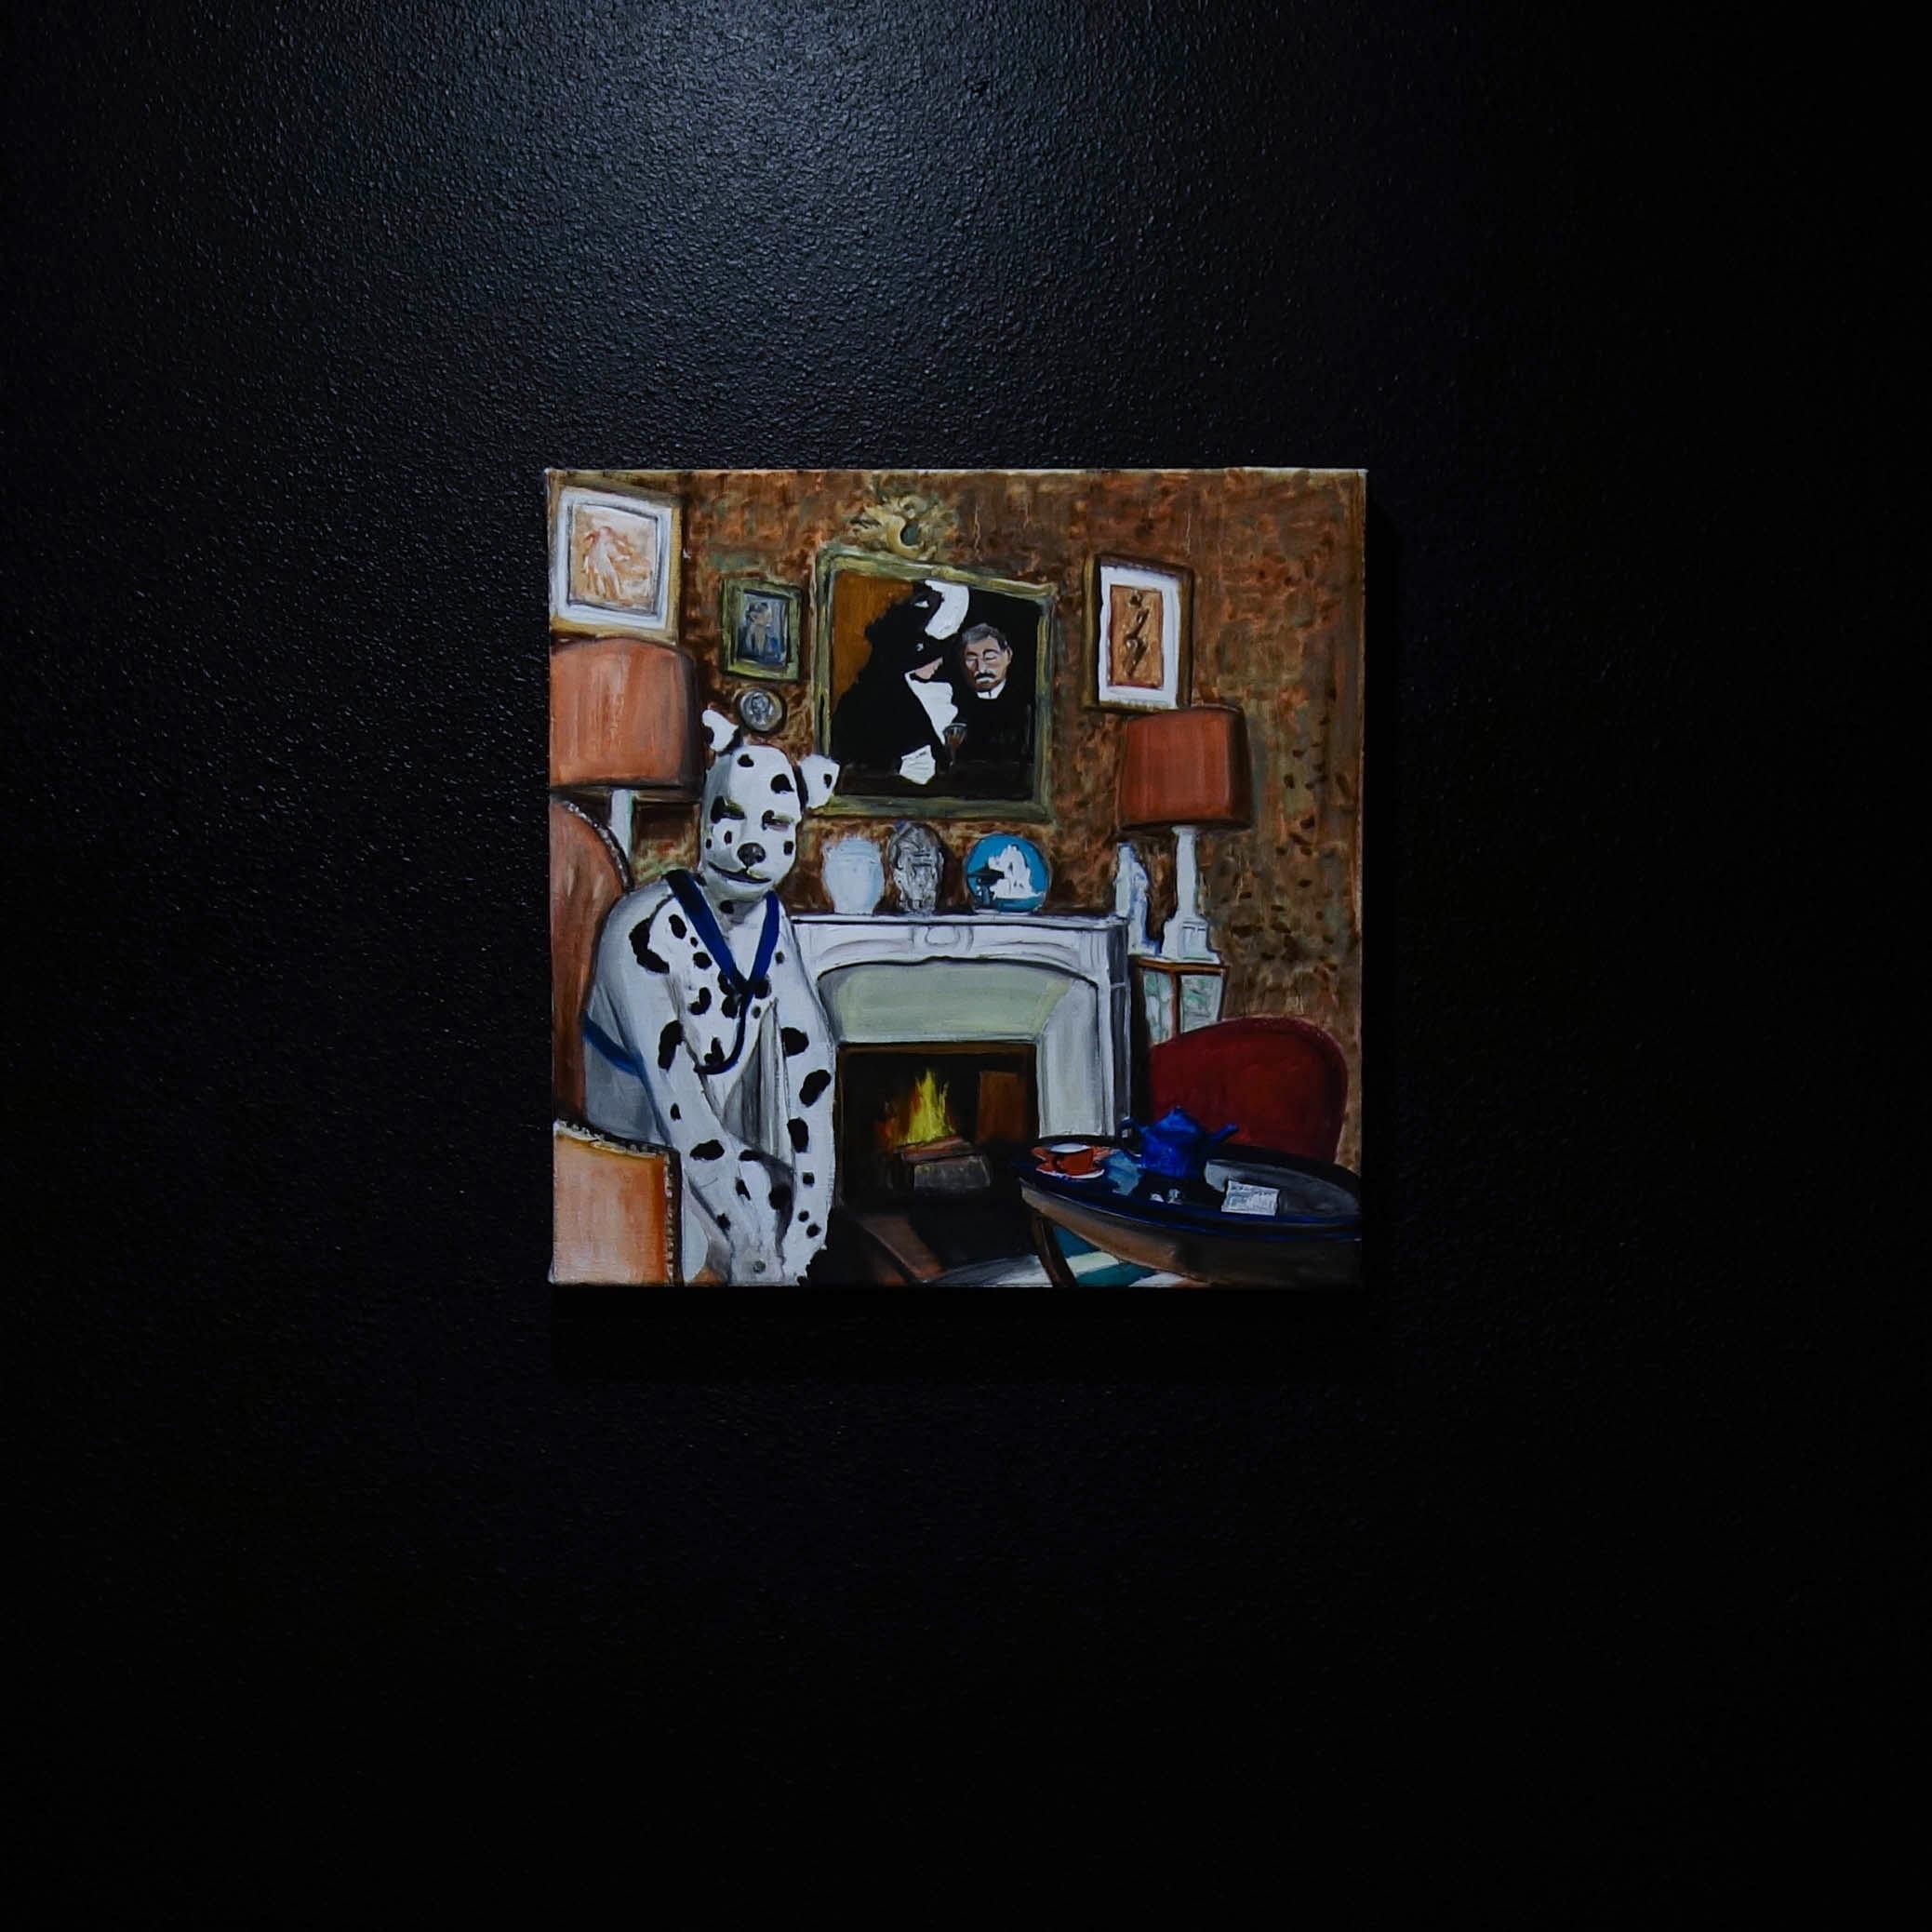 cyril-kuhn-puppyman-interior-11.jpg